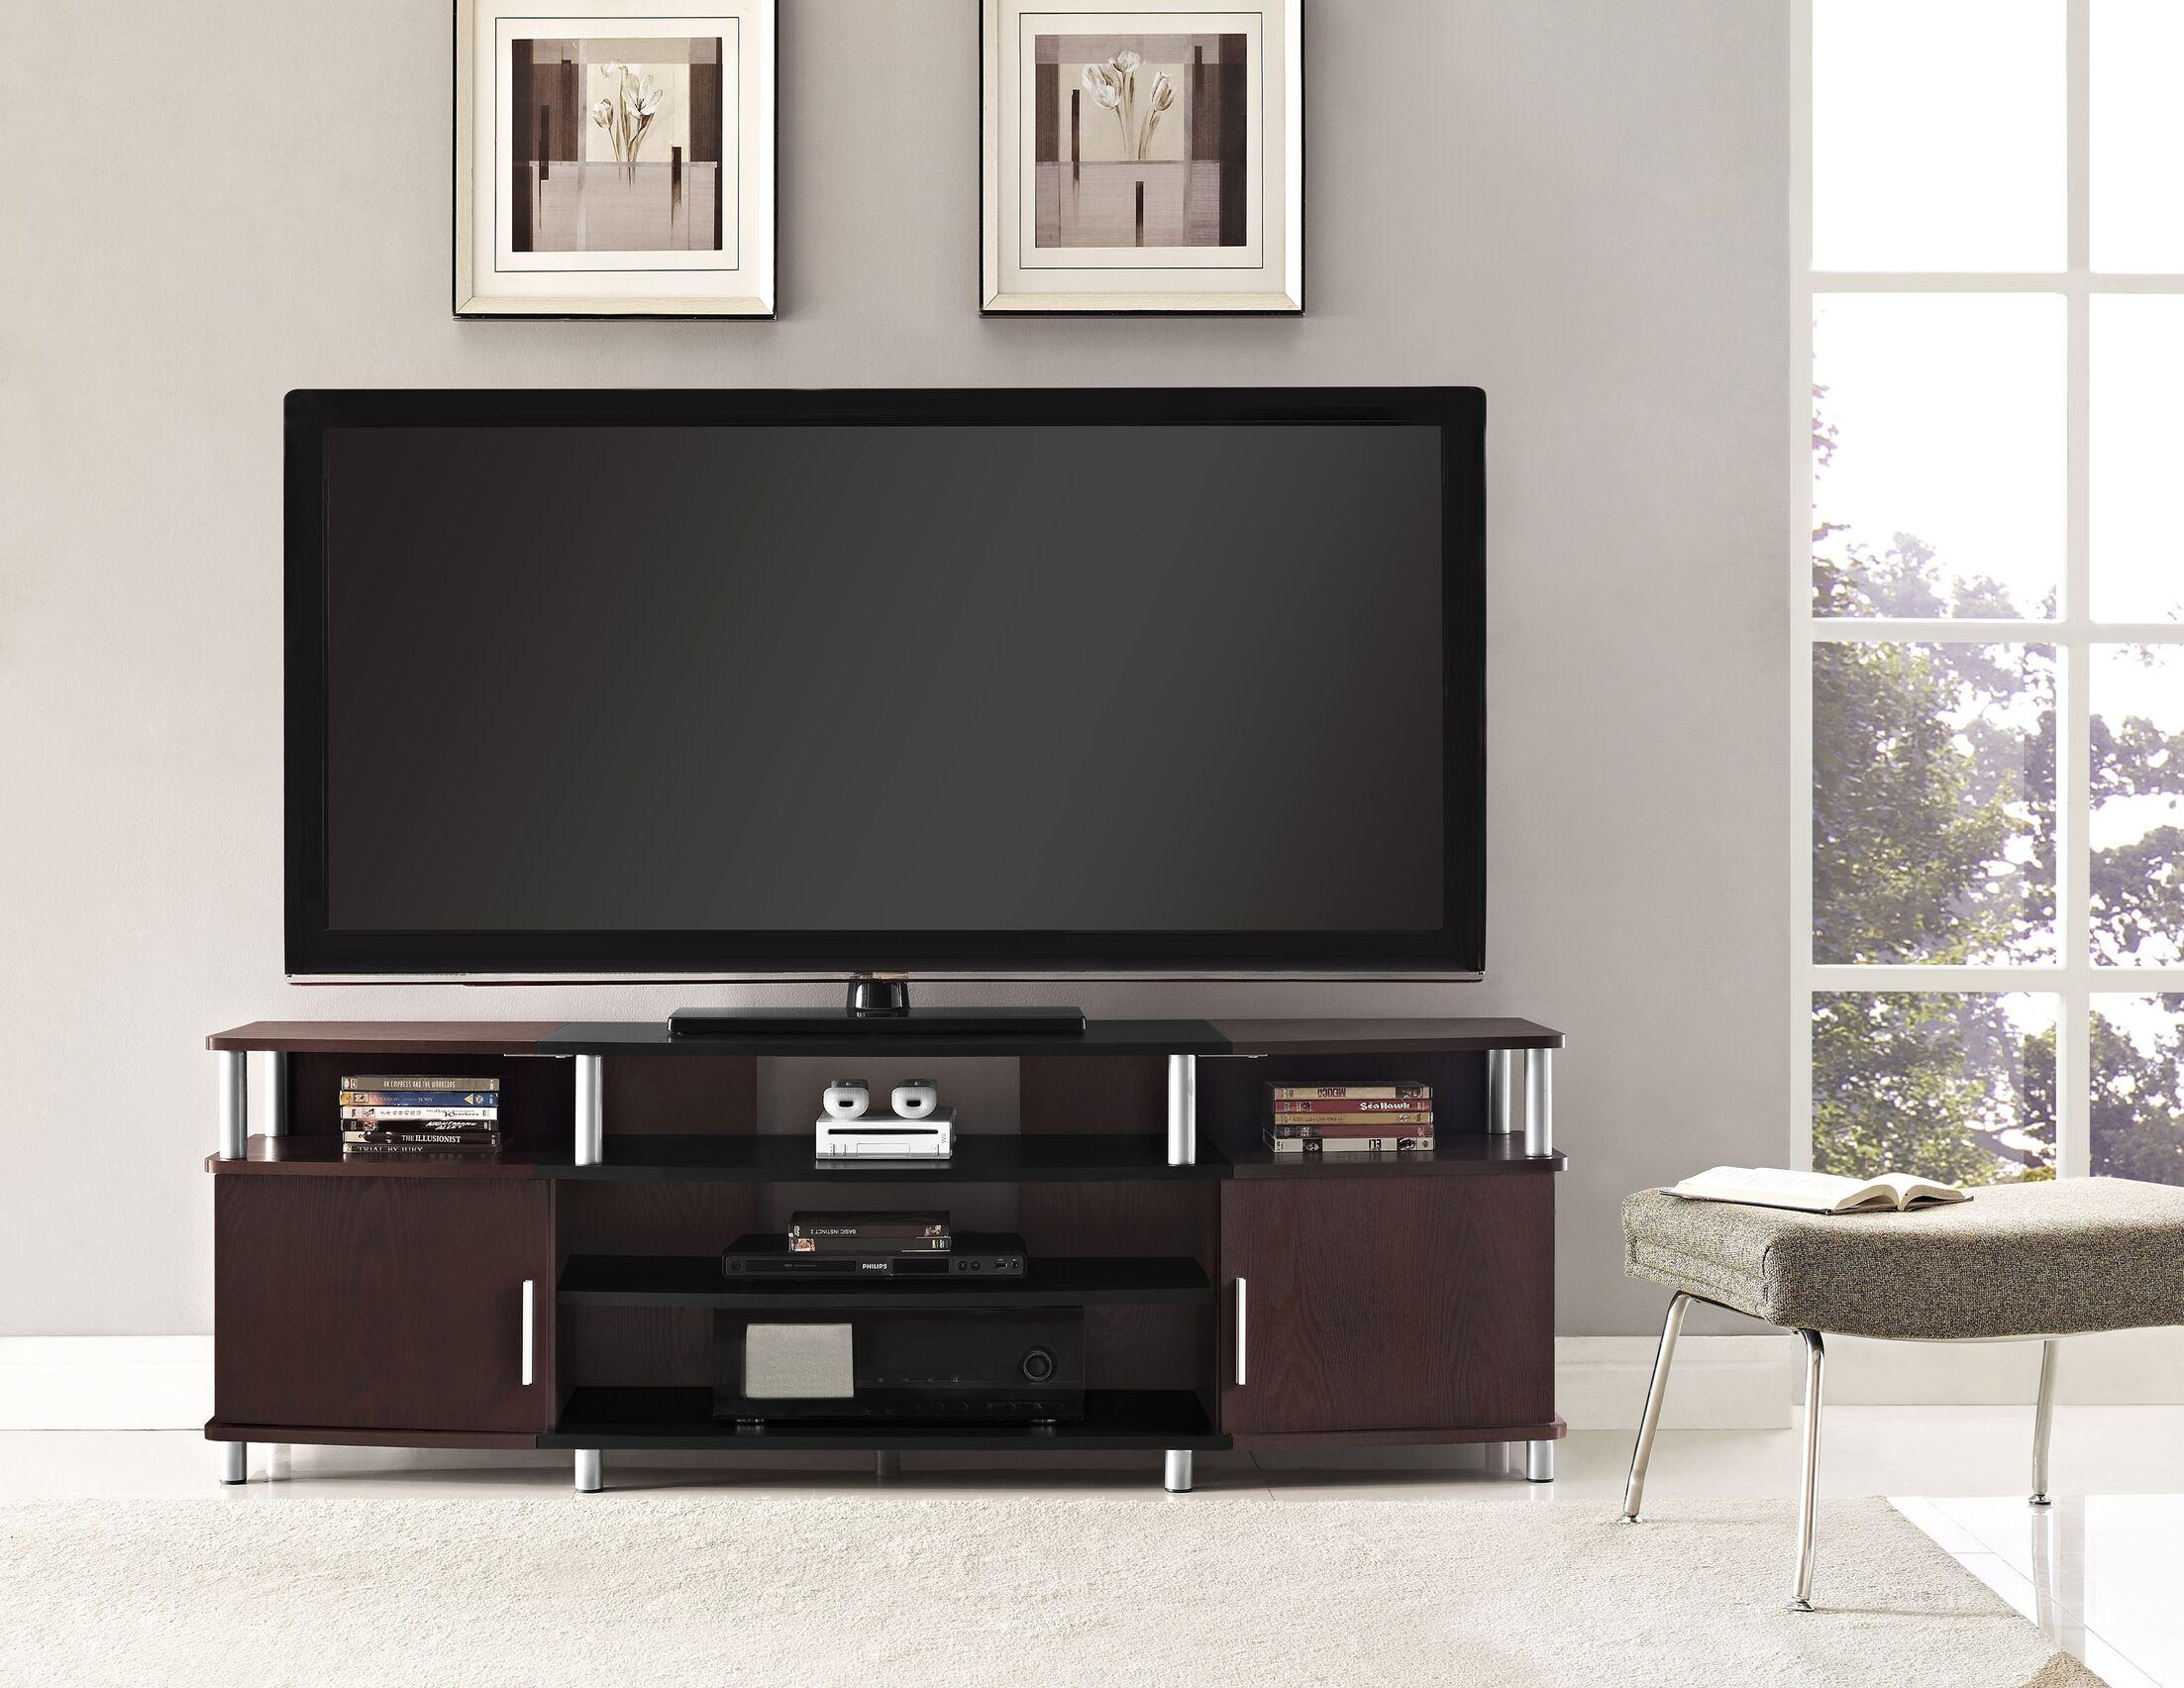 Elian TV Stand Color: Black/Cherry, Size: 63